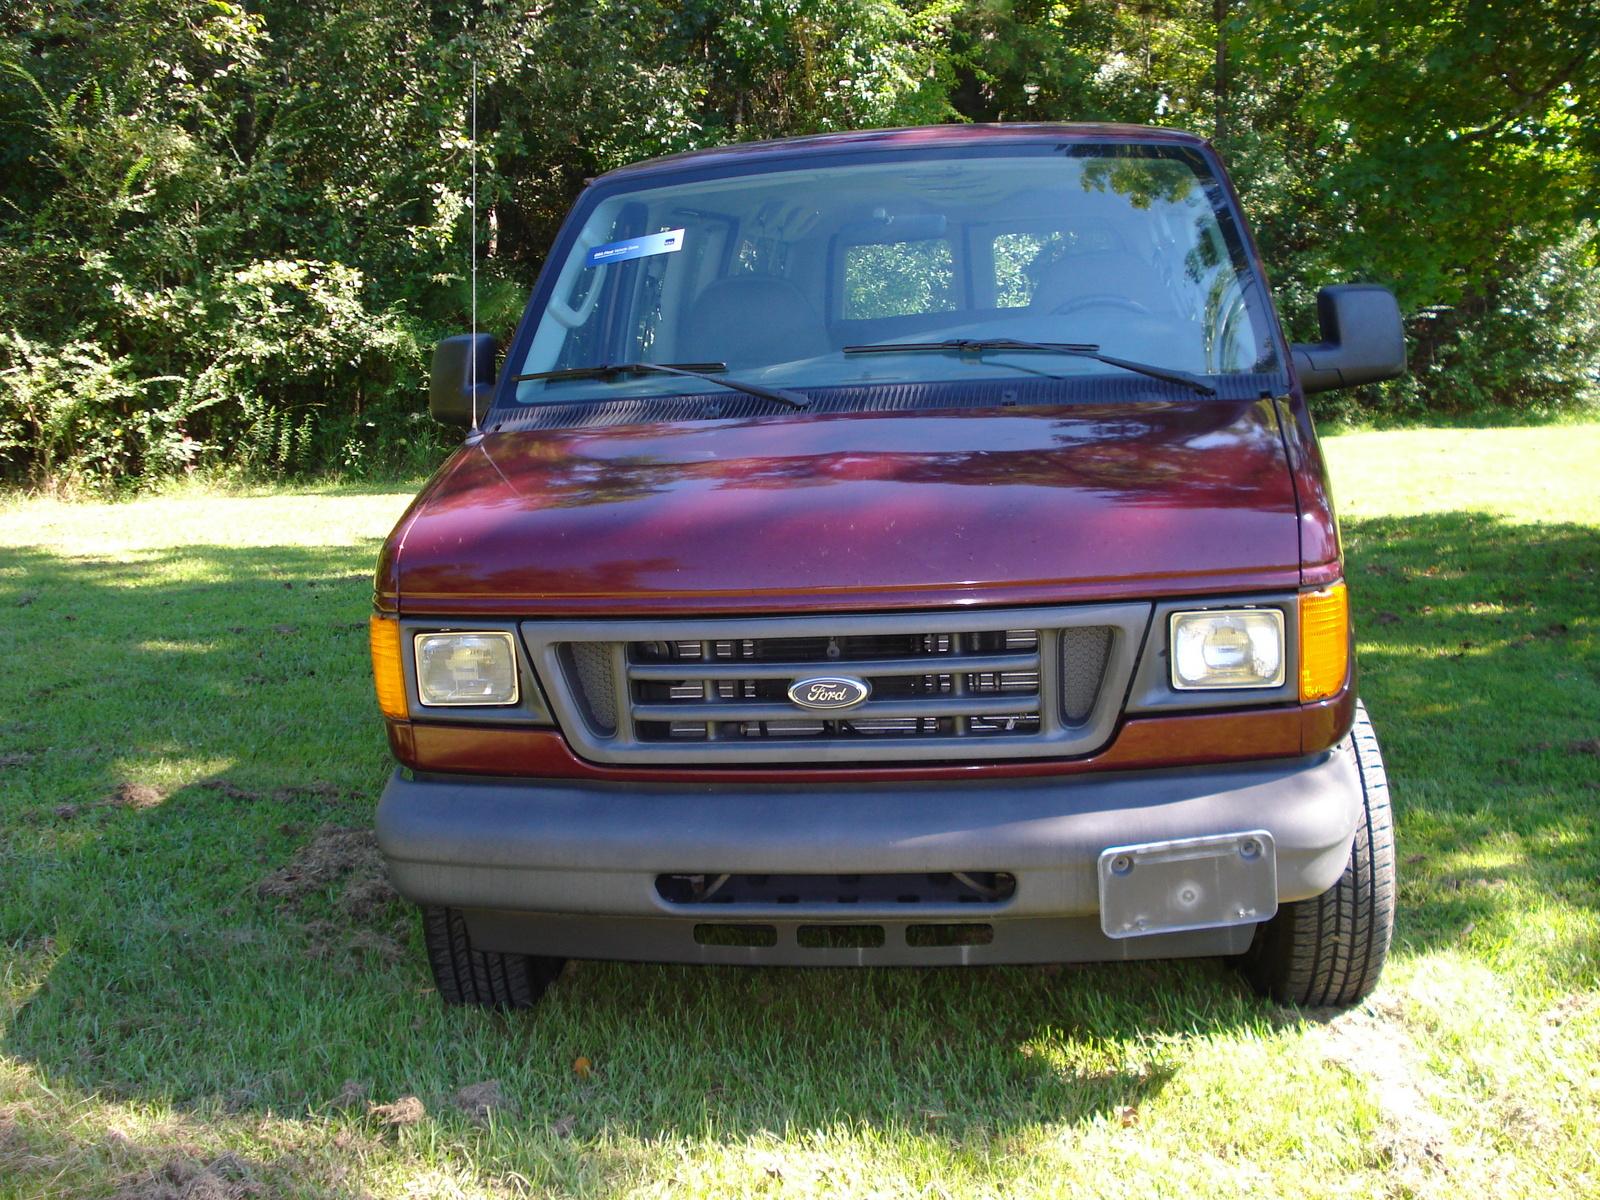 Picture of 2004 Ford Econoline Wagon 3 Dr E-150 XL Passenger Van